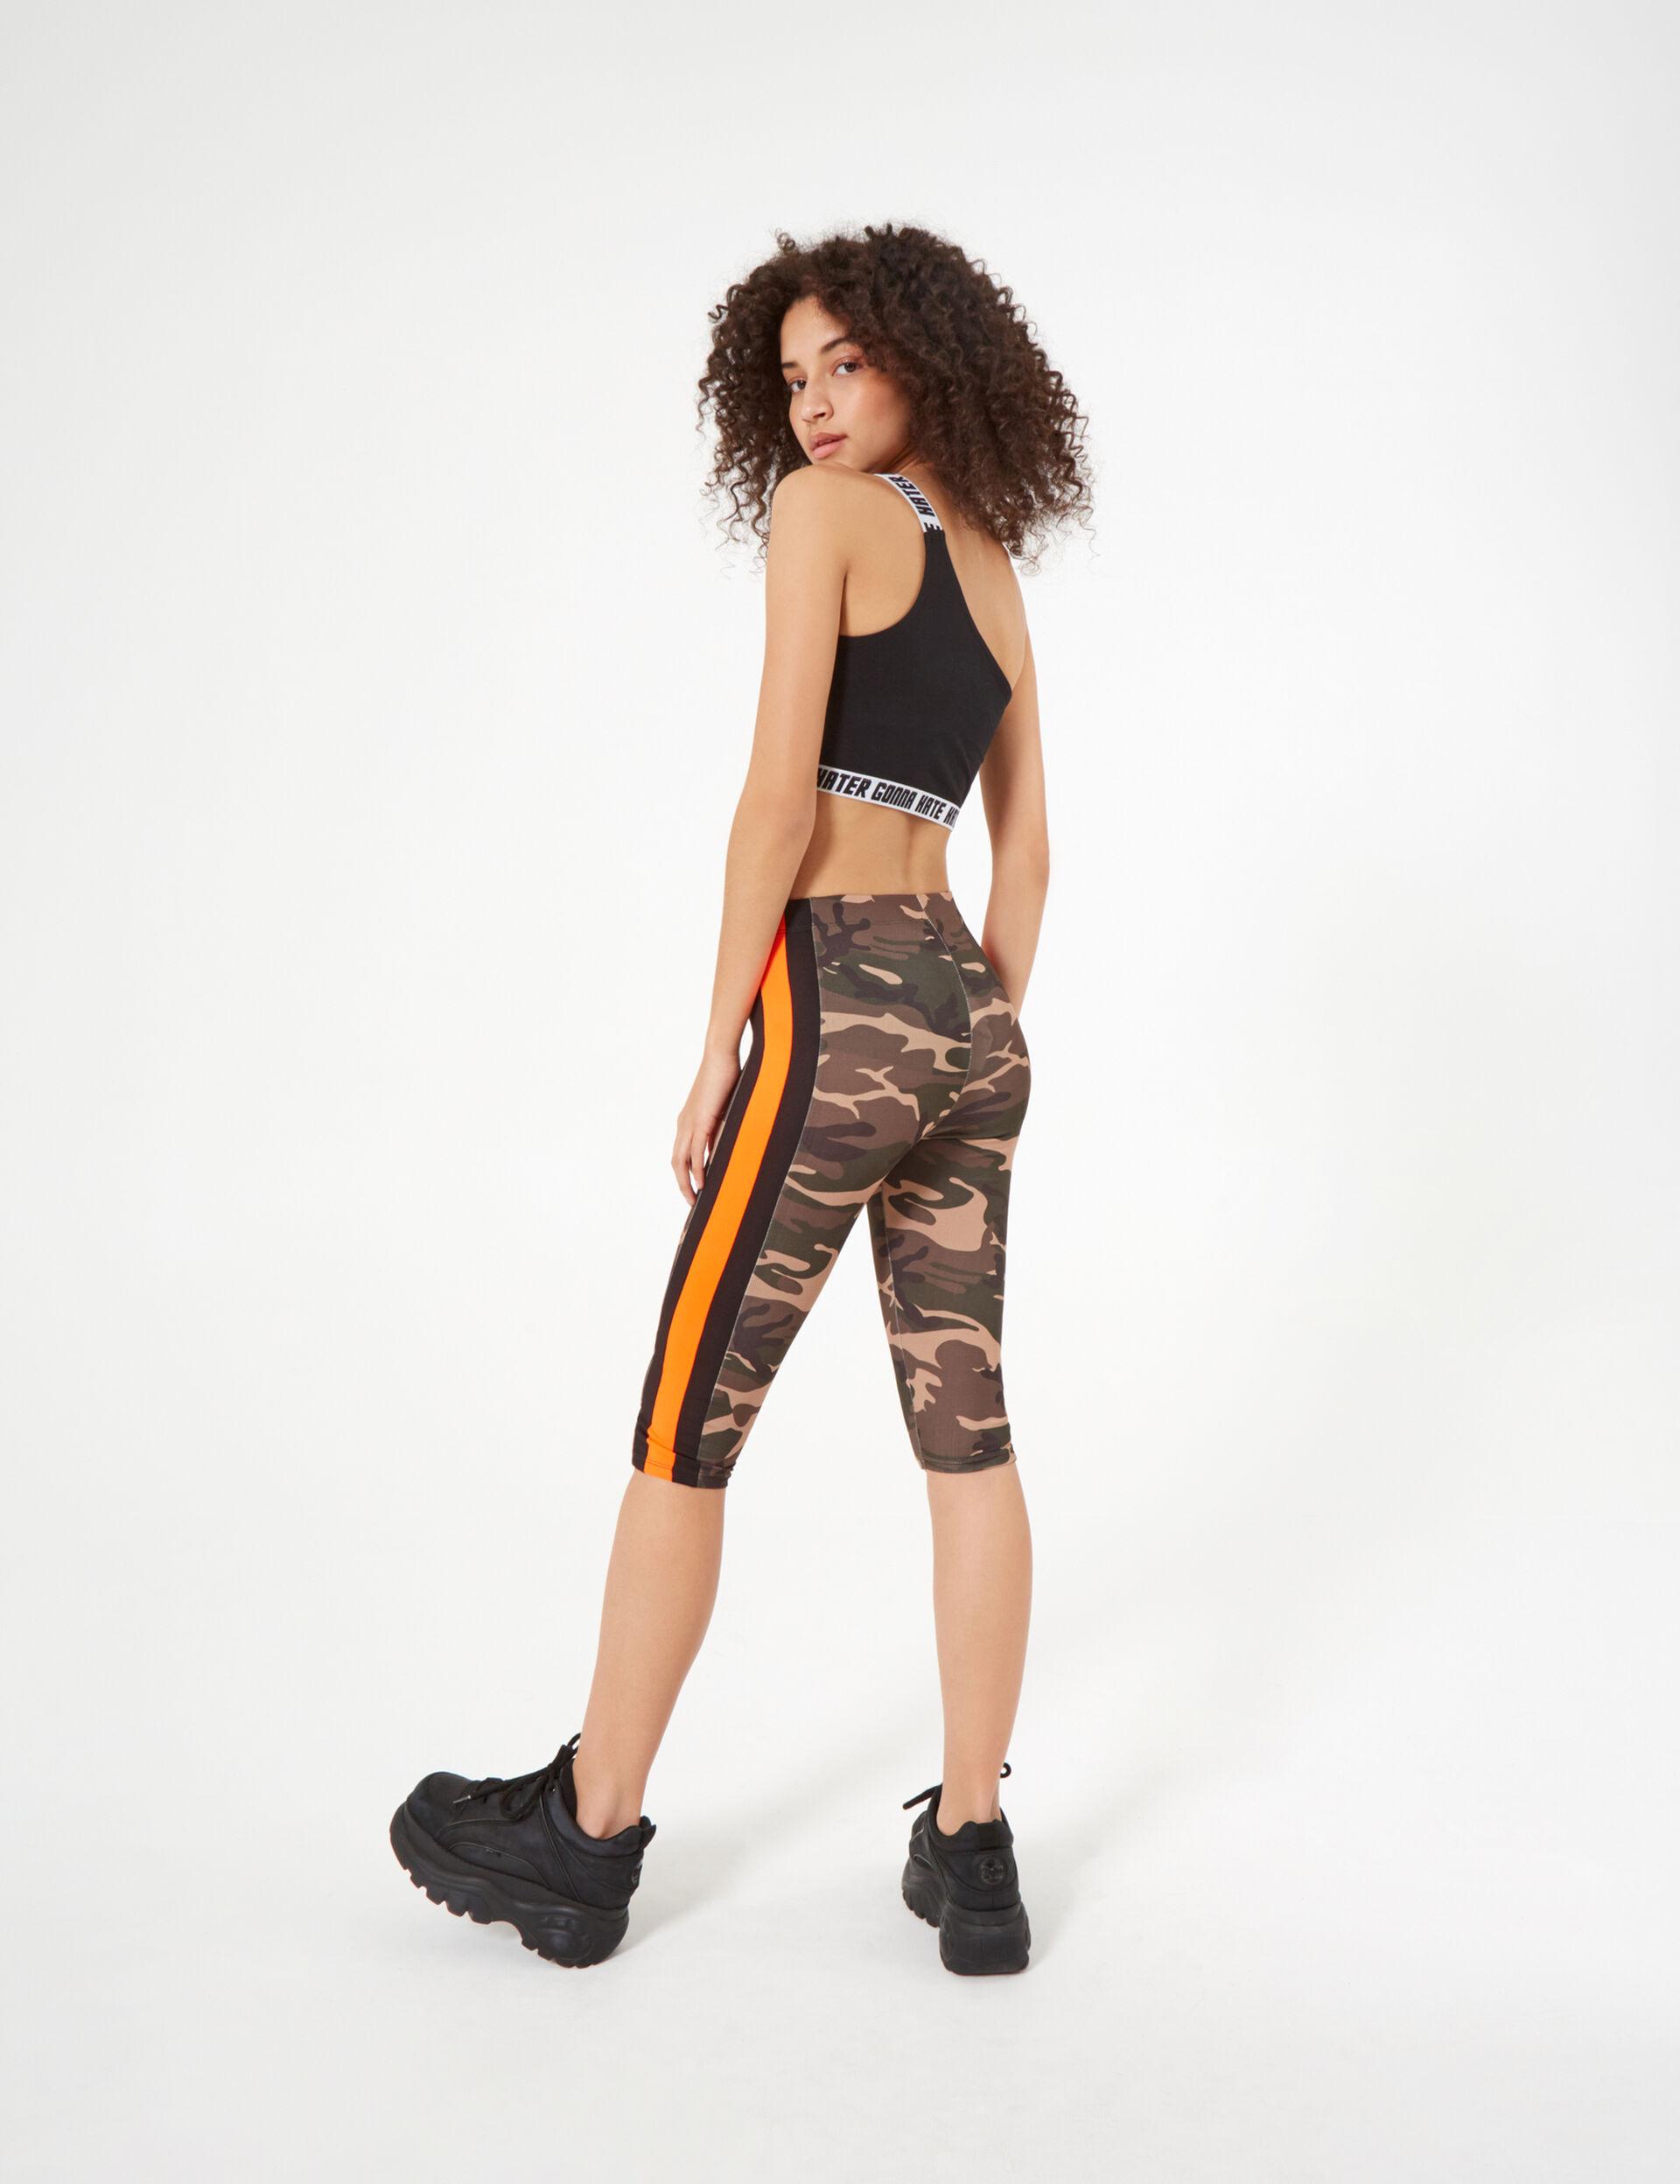 Cycliste camouflage kaki et orange fluo